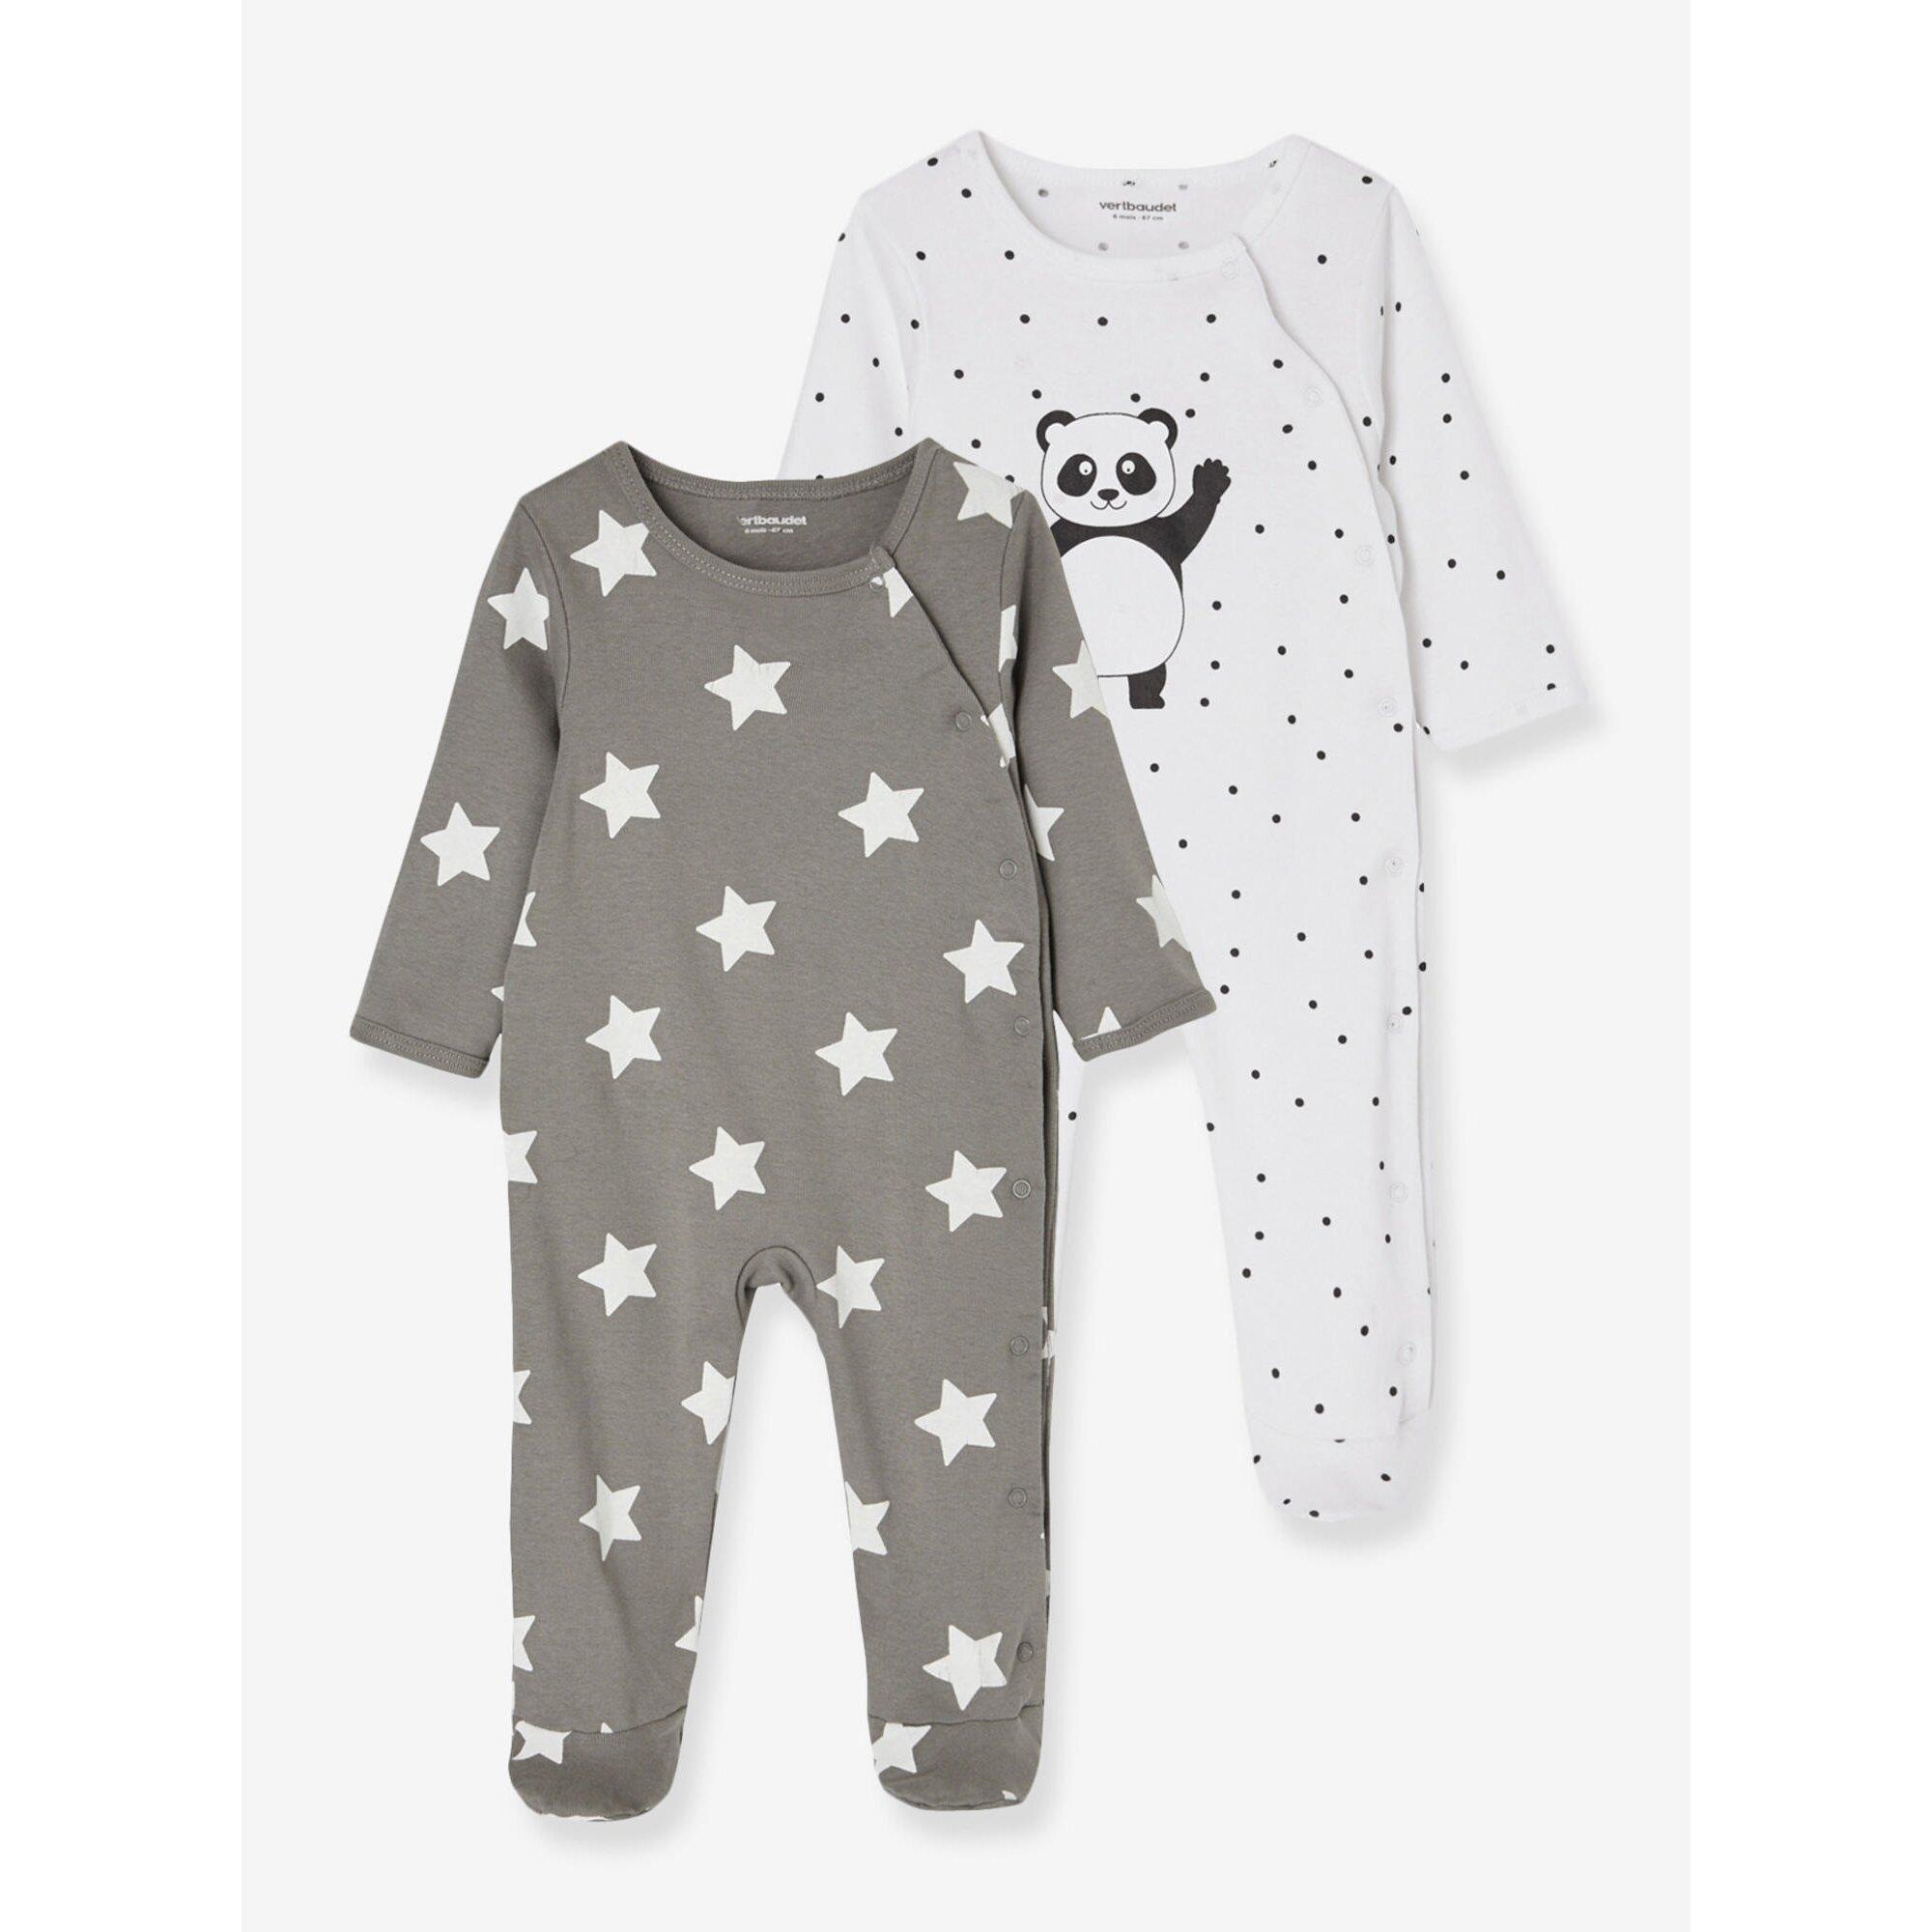 vertbaudet-2er-pack-babystrampler-aus-baumwolle